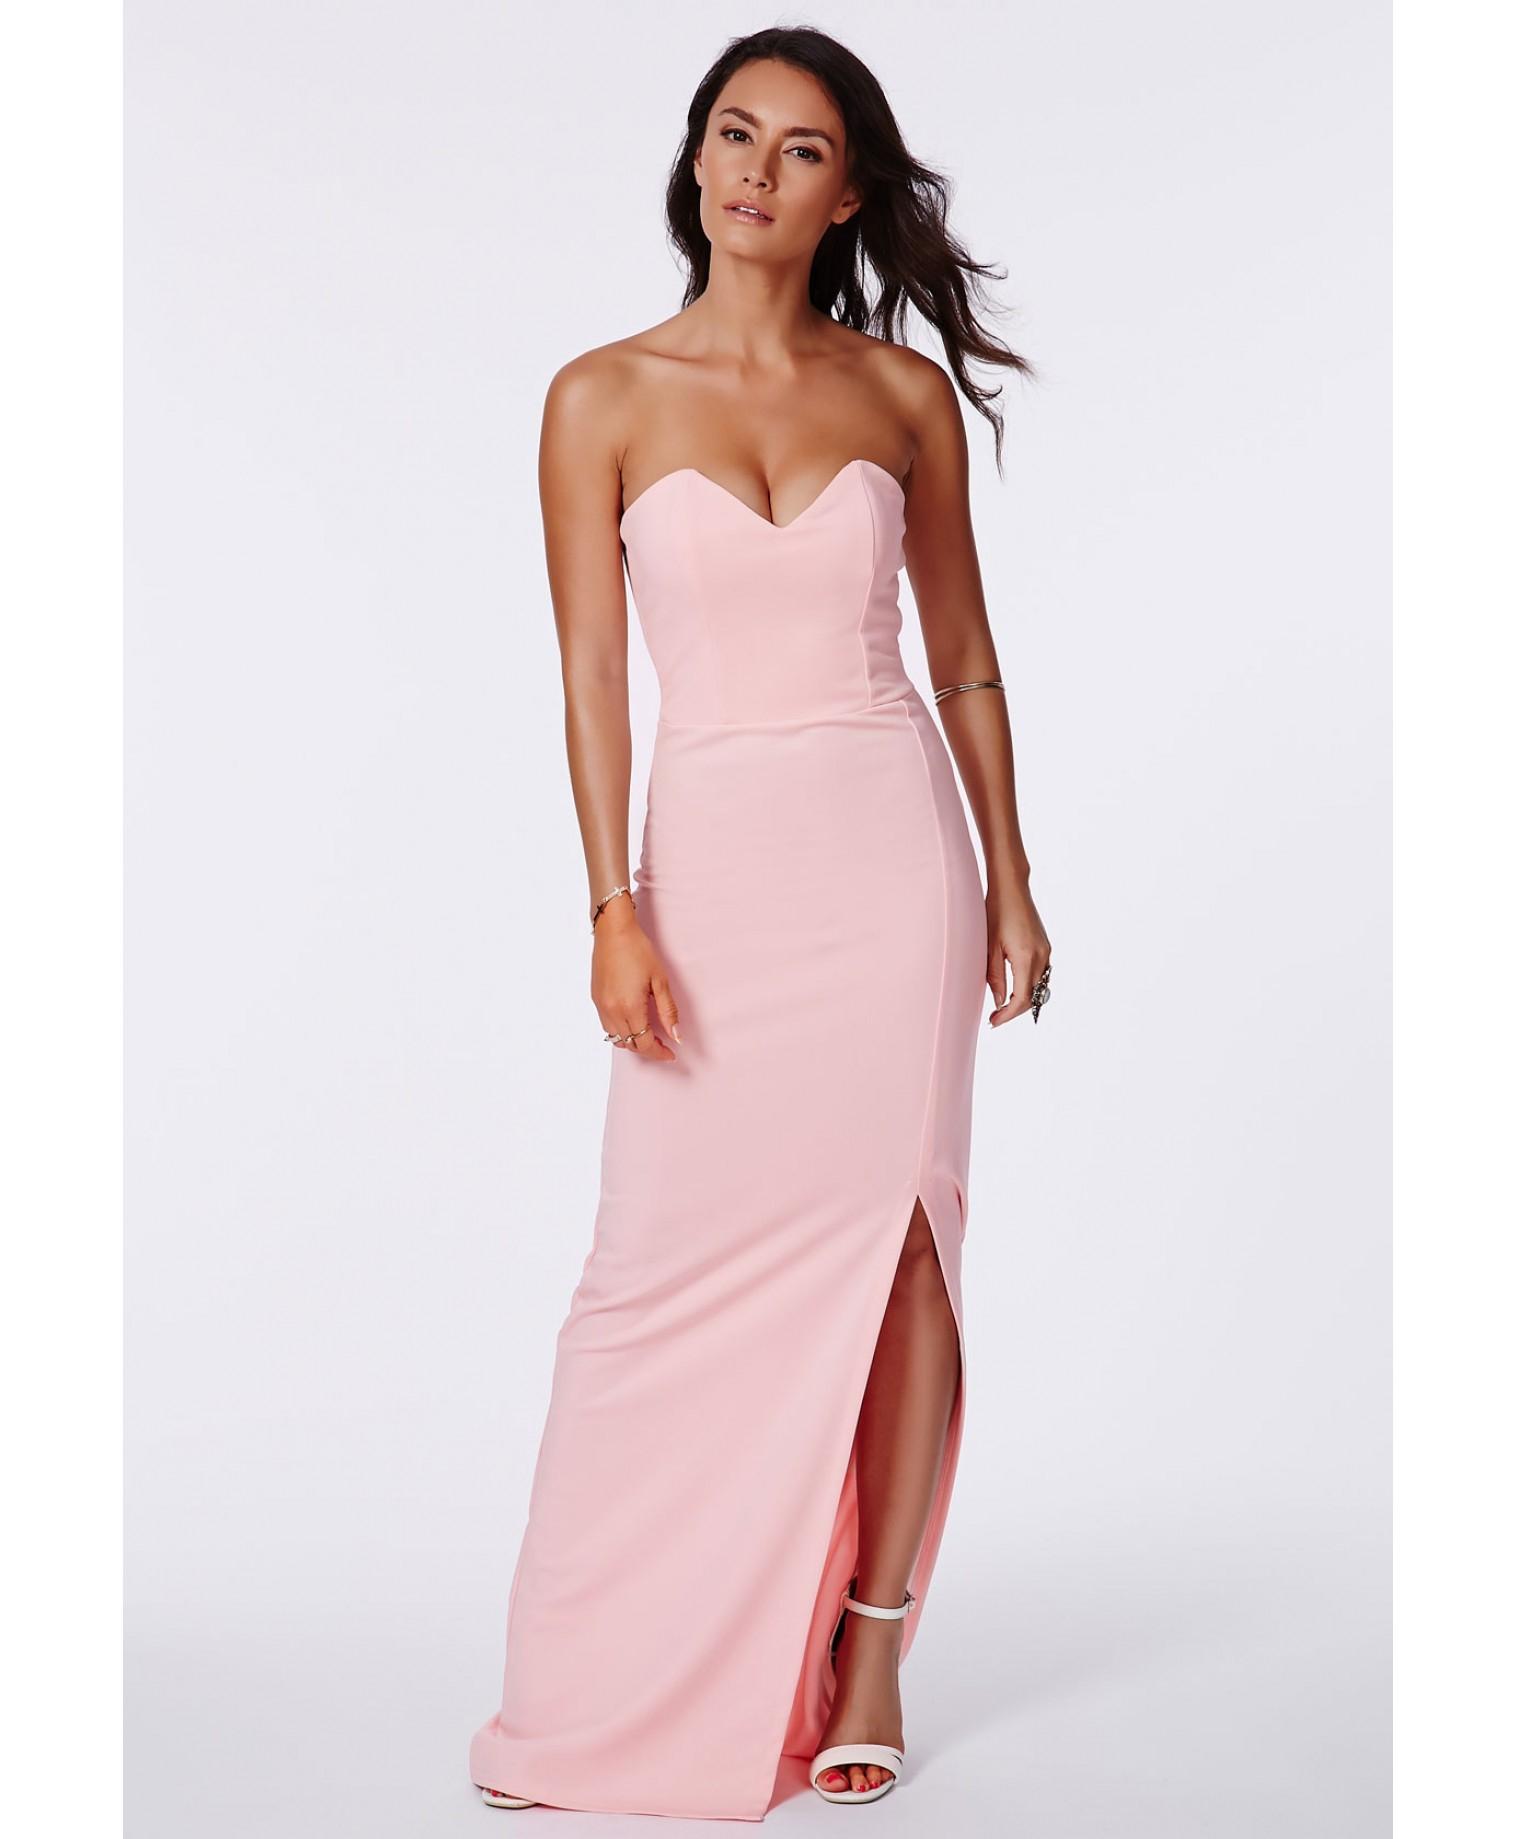 Bottomless Prom Dresses – Fashion dresses